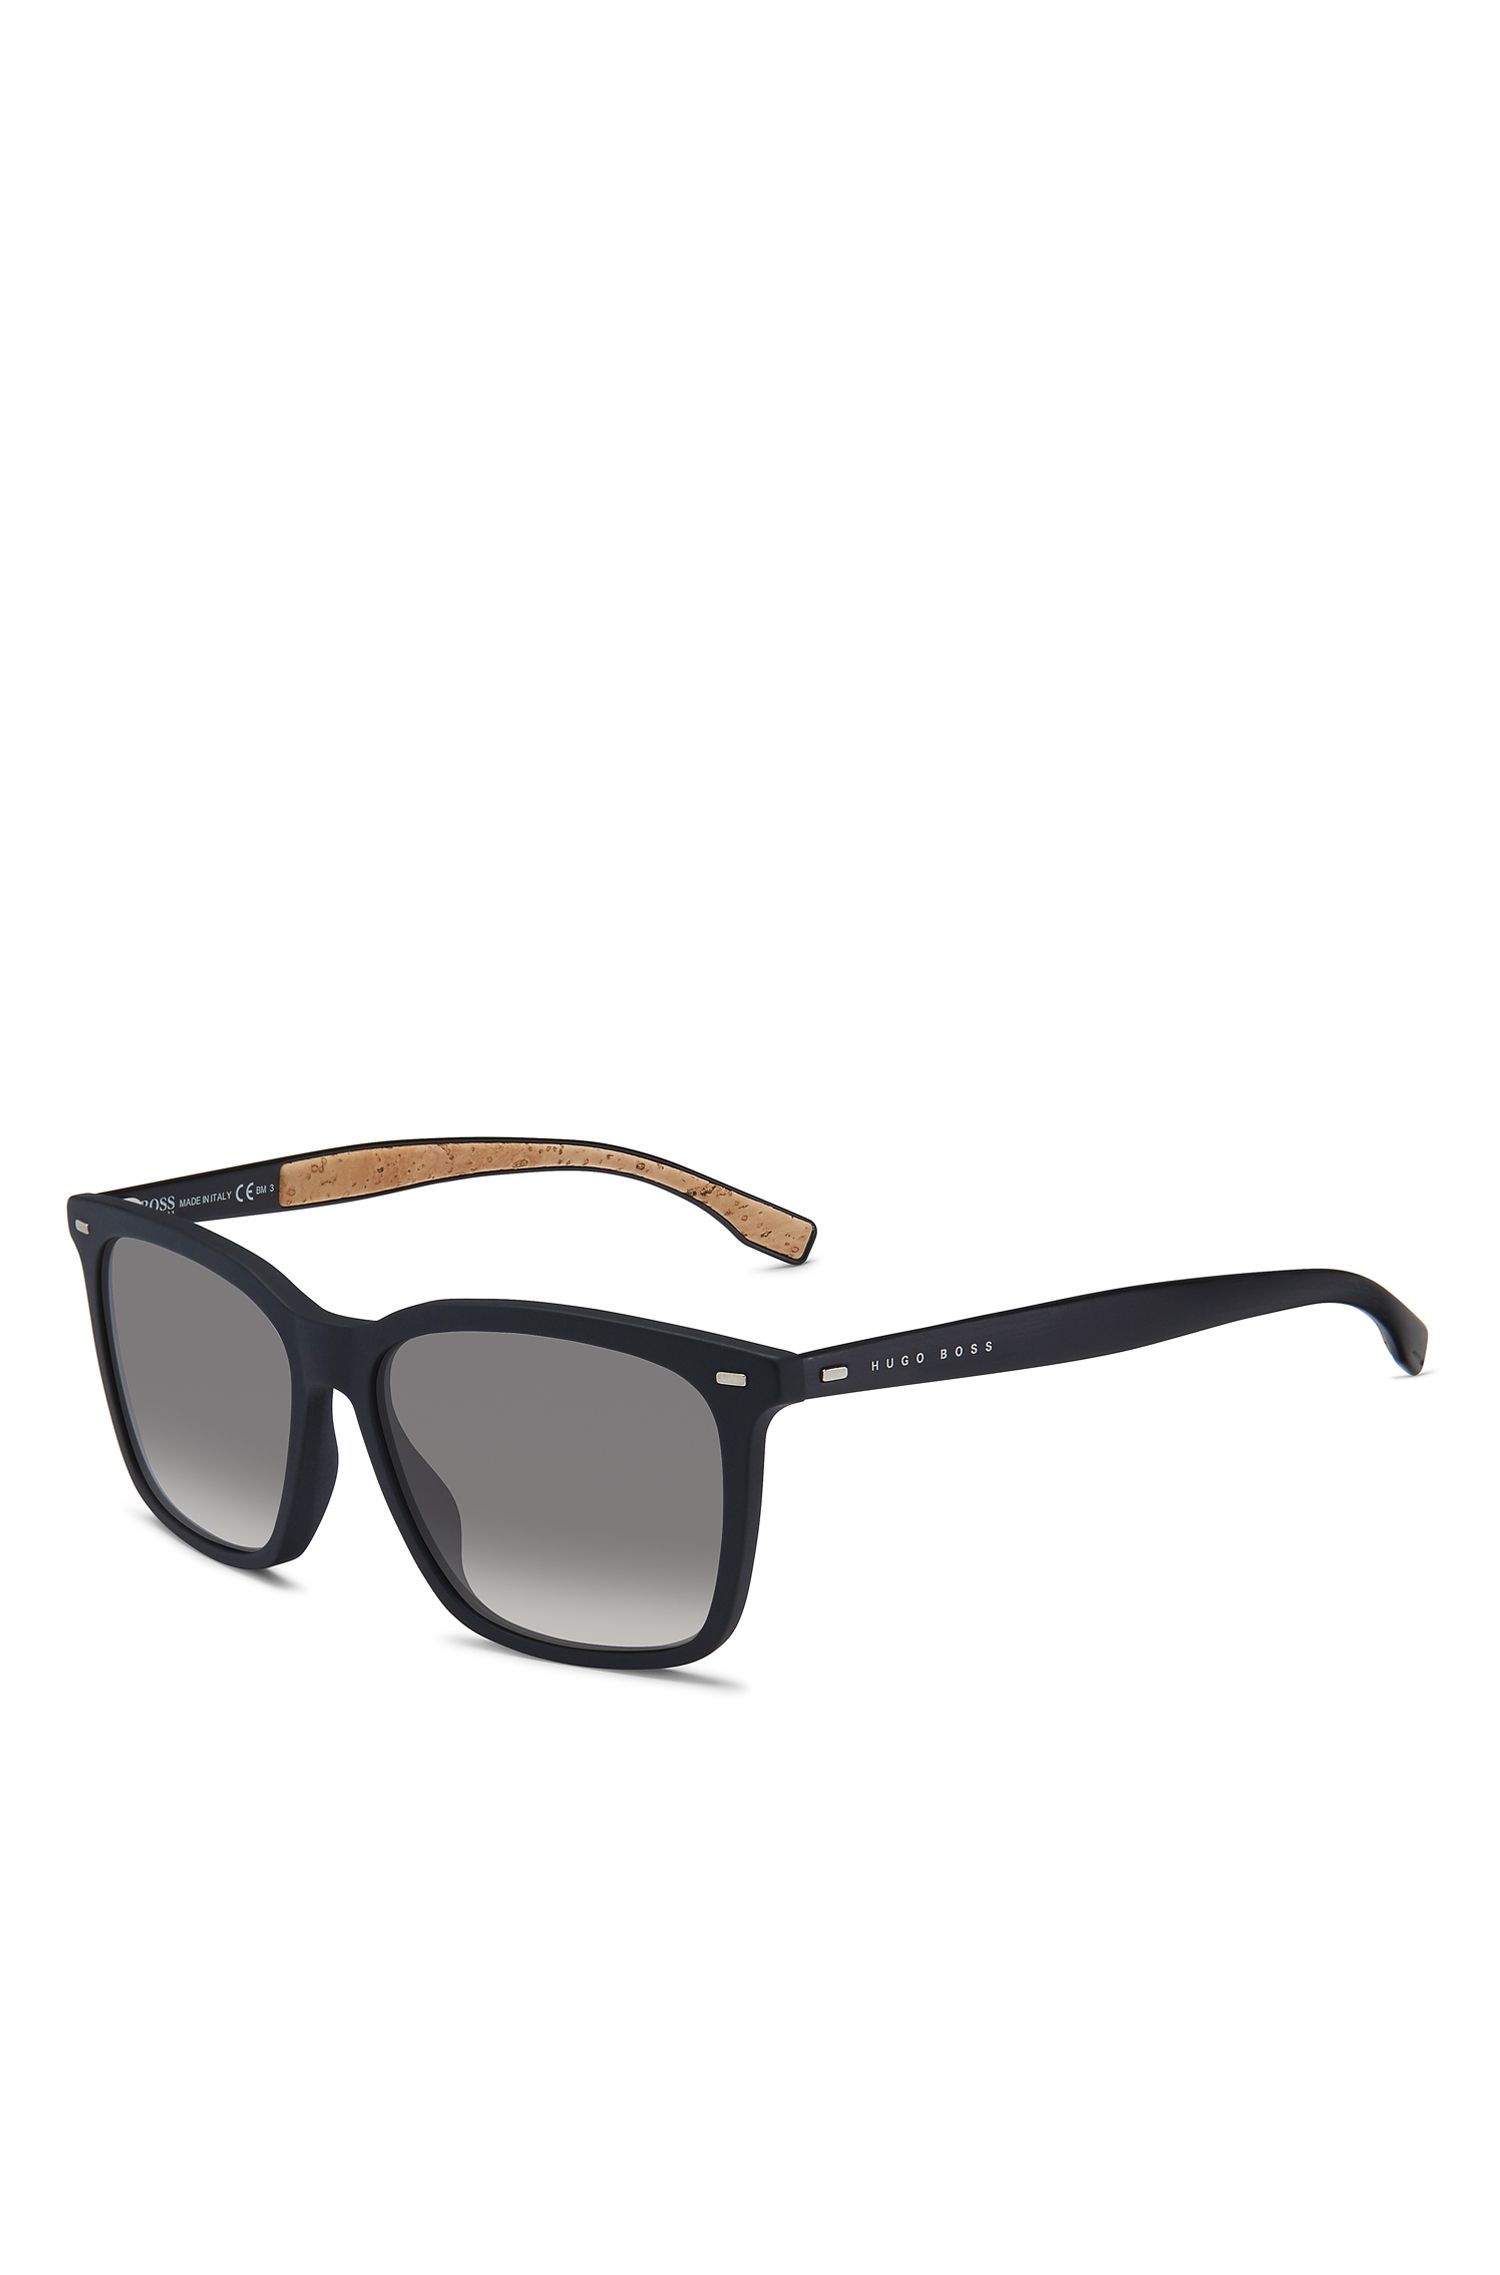 'BOSS 0883S' | Black Acetate Rectangular Sunglasses